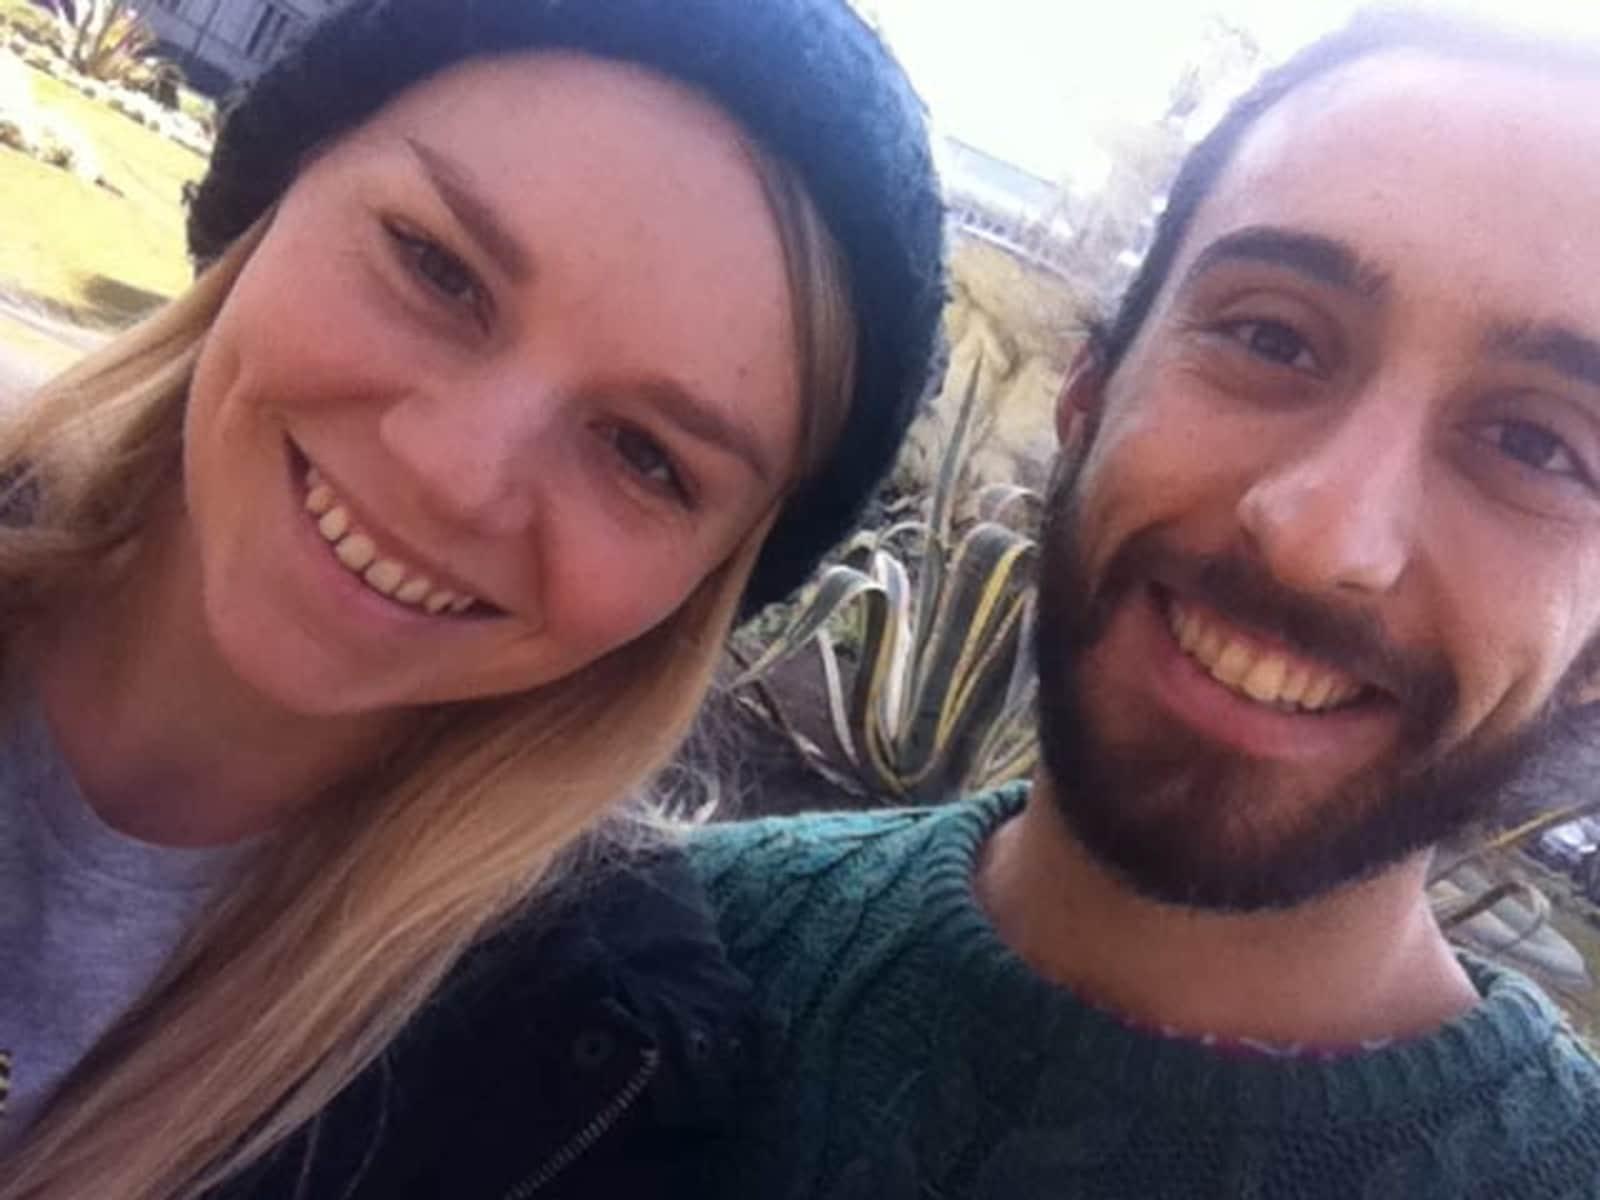 Kimberly & Aaron from Adelaide, South Australia, Australia